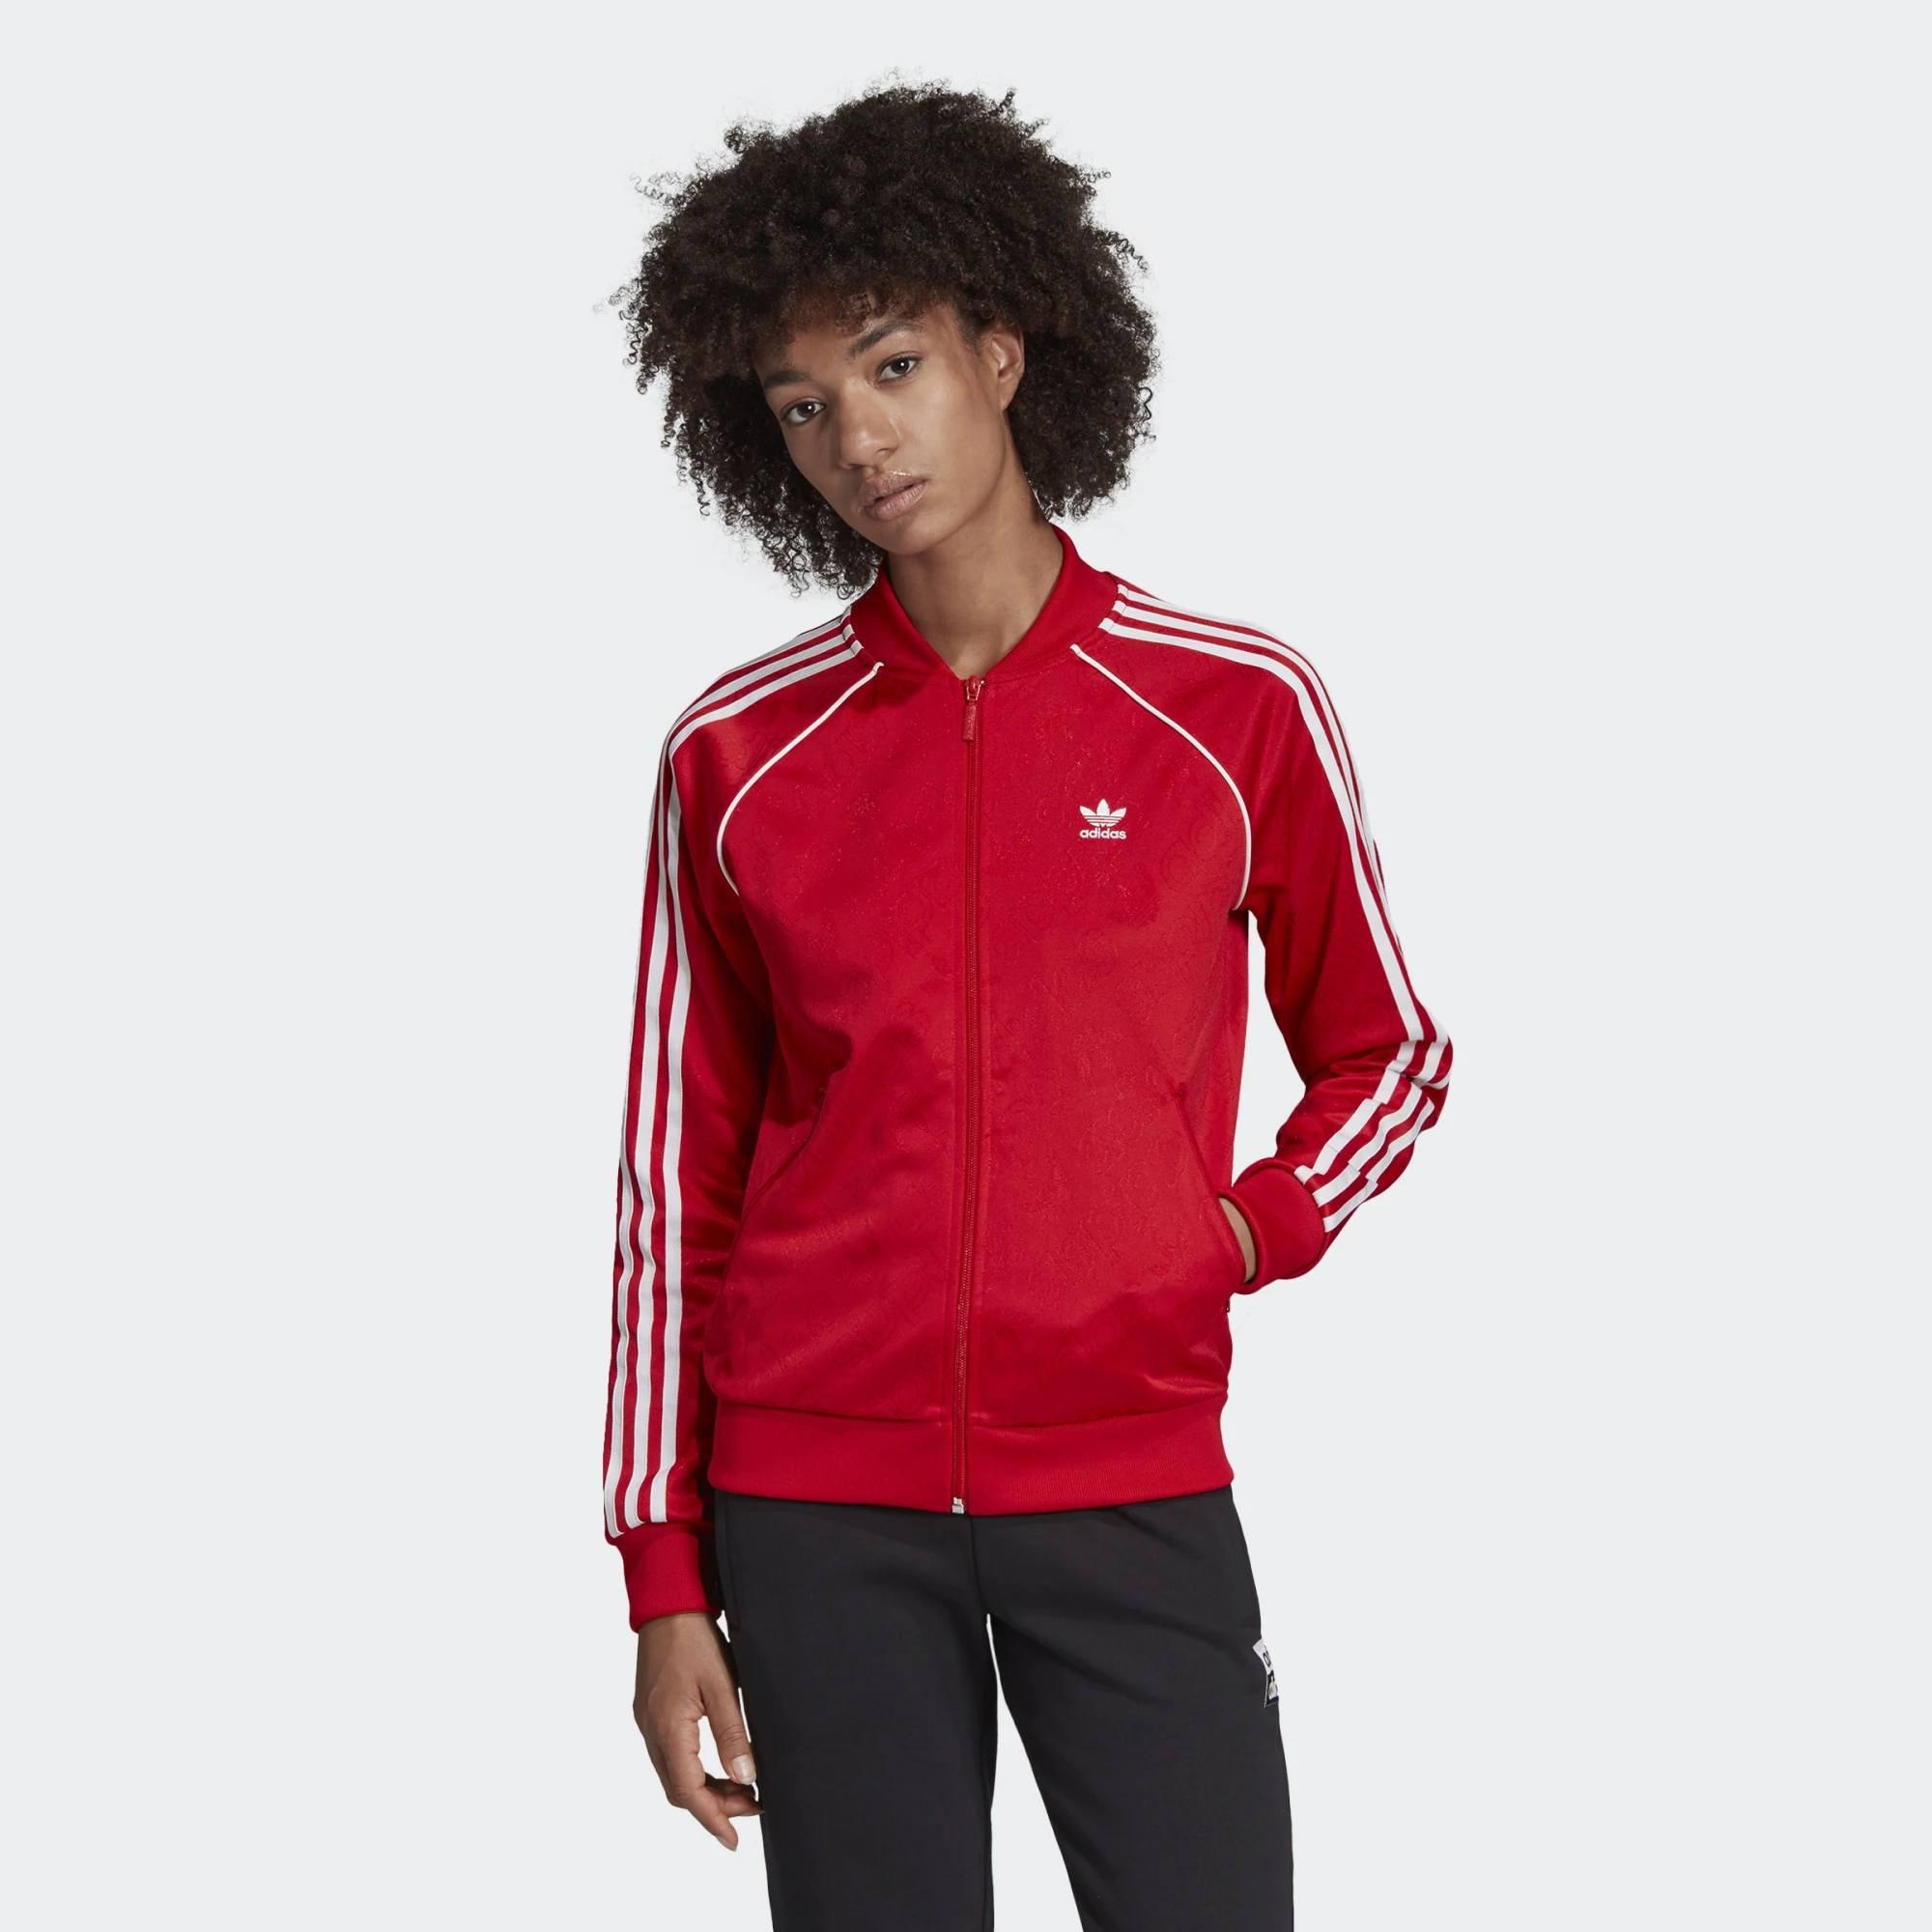 28 Fresh Adidas Sst Track Jacket Good Ideas adidas sst